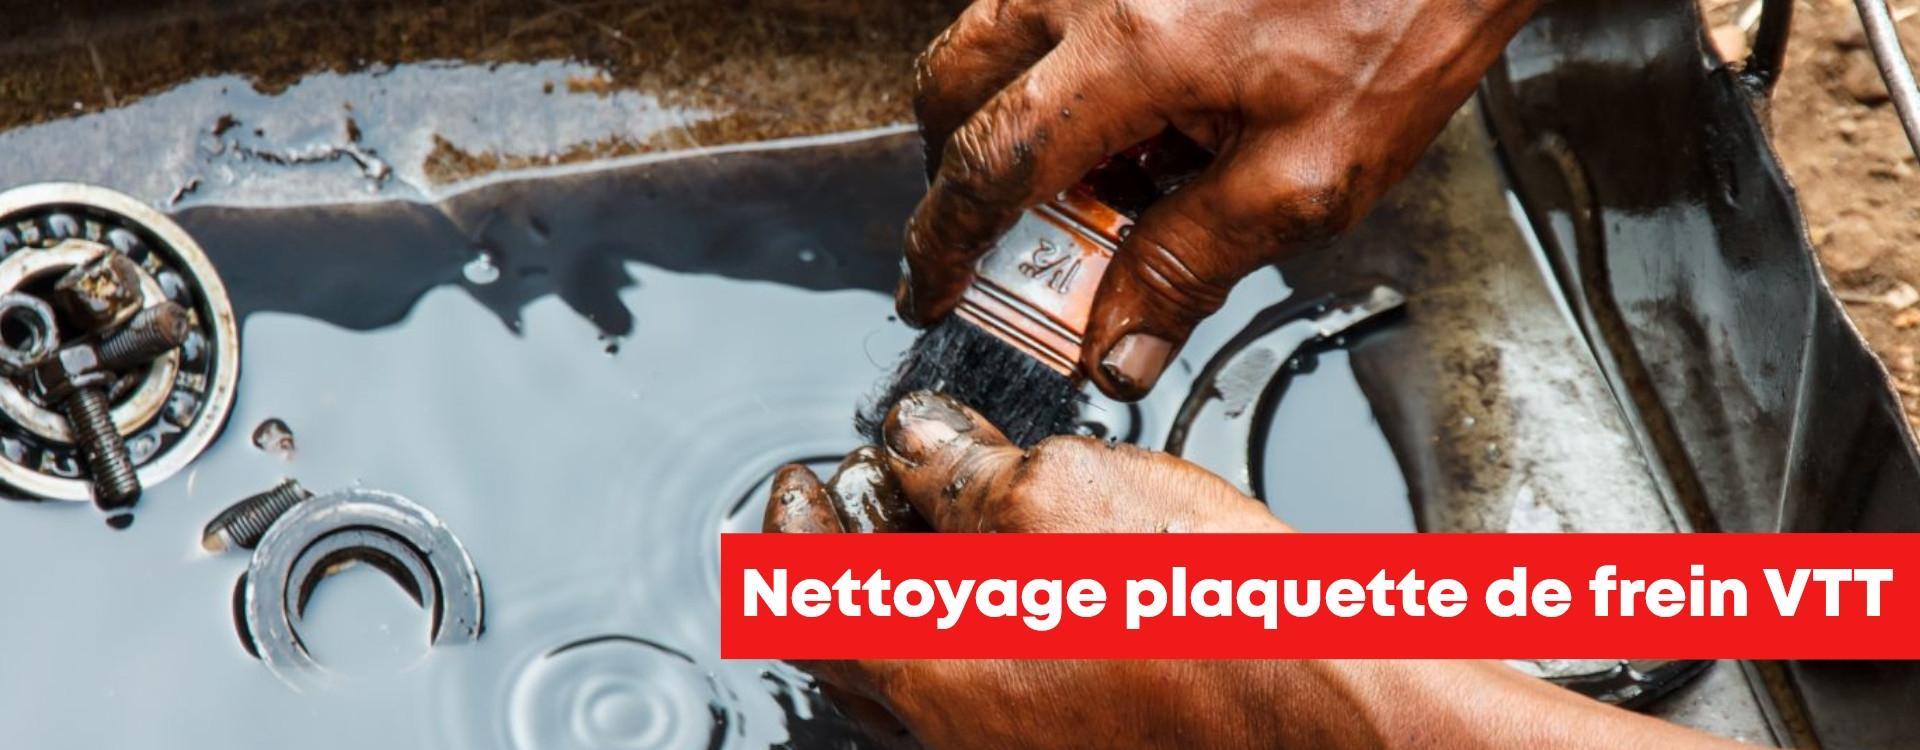 Nettoyage plaquette de frein VTT !